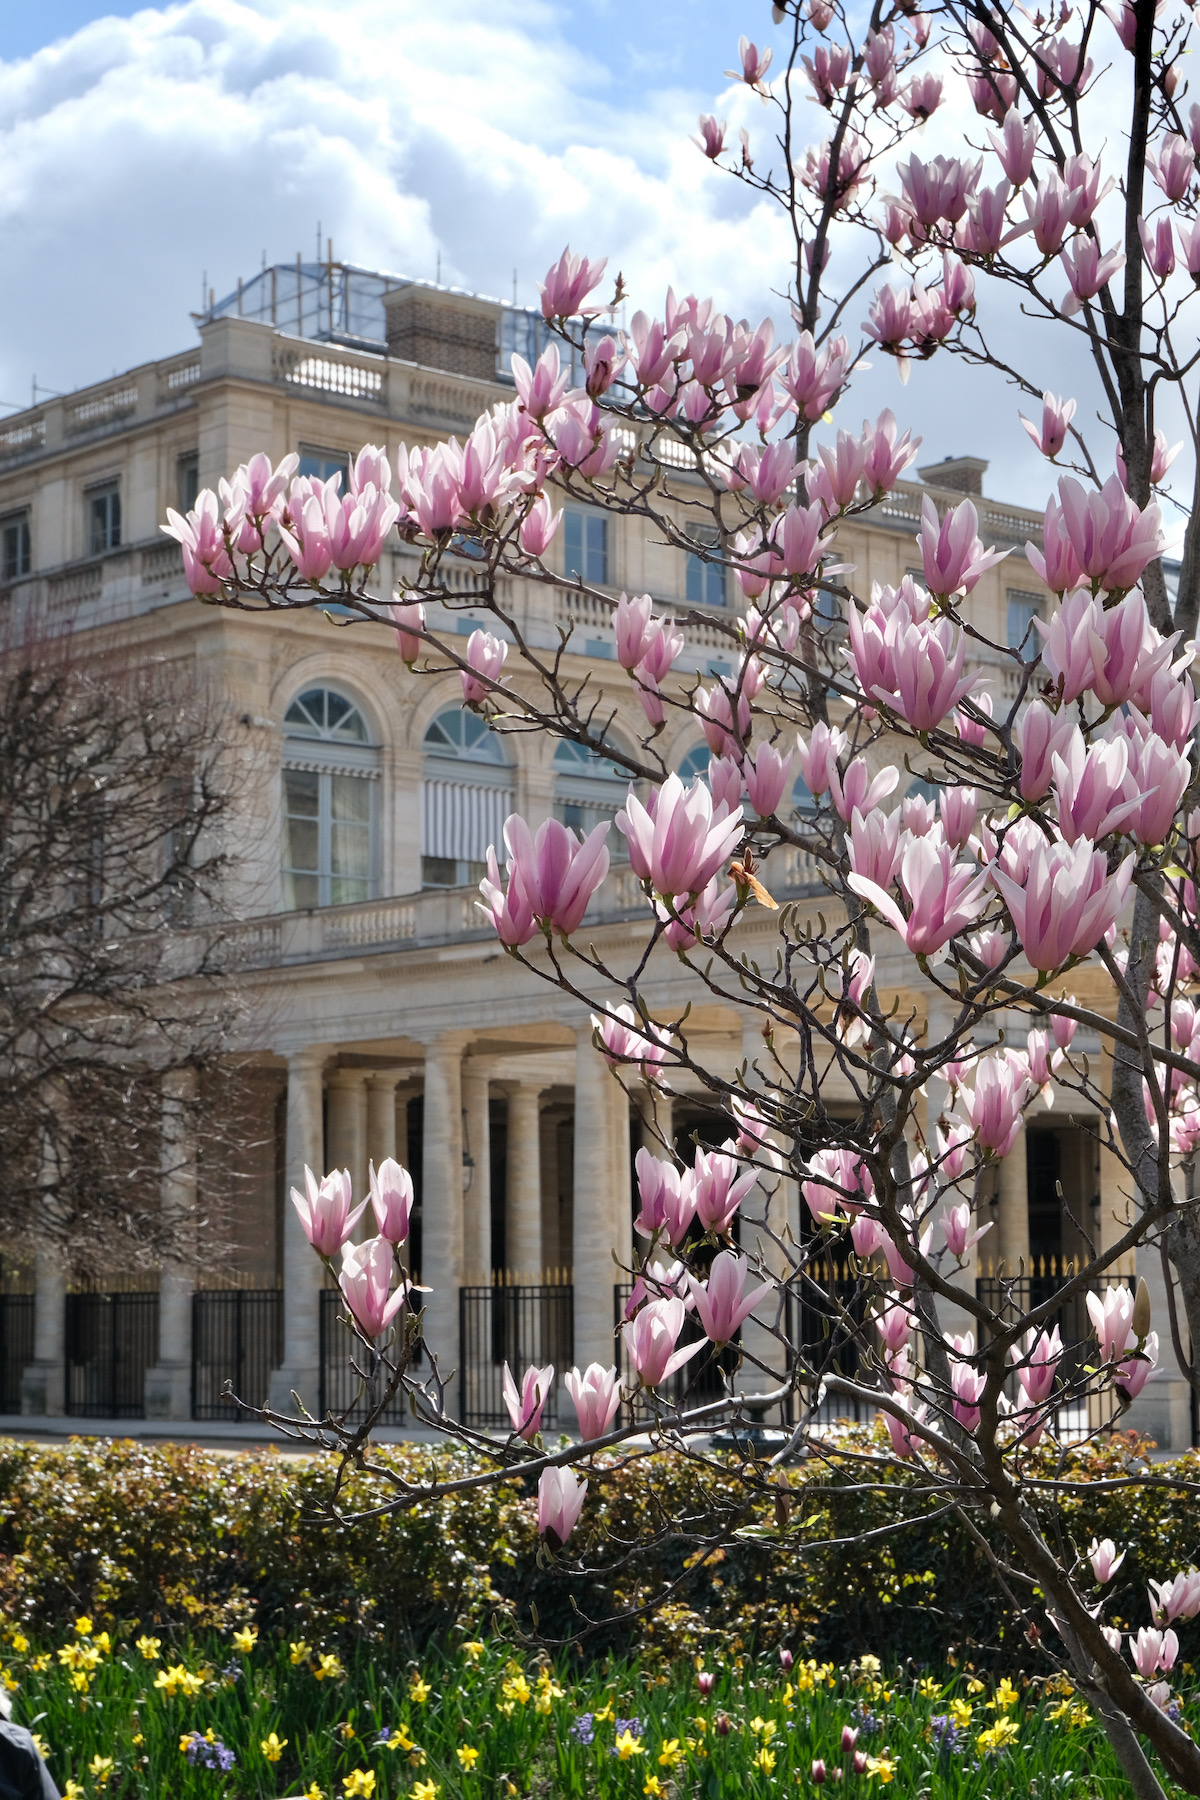 pink magnolias in the jardin du palais royal